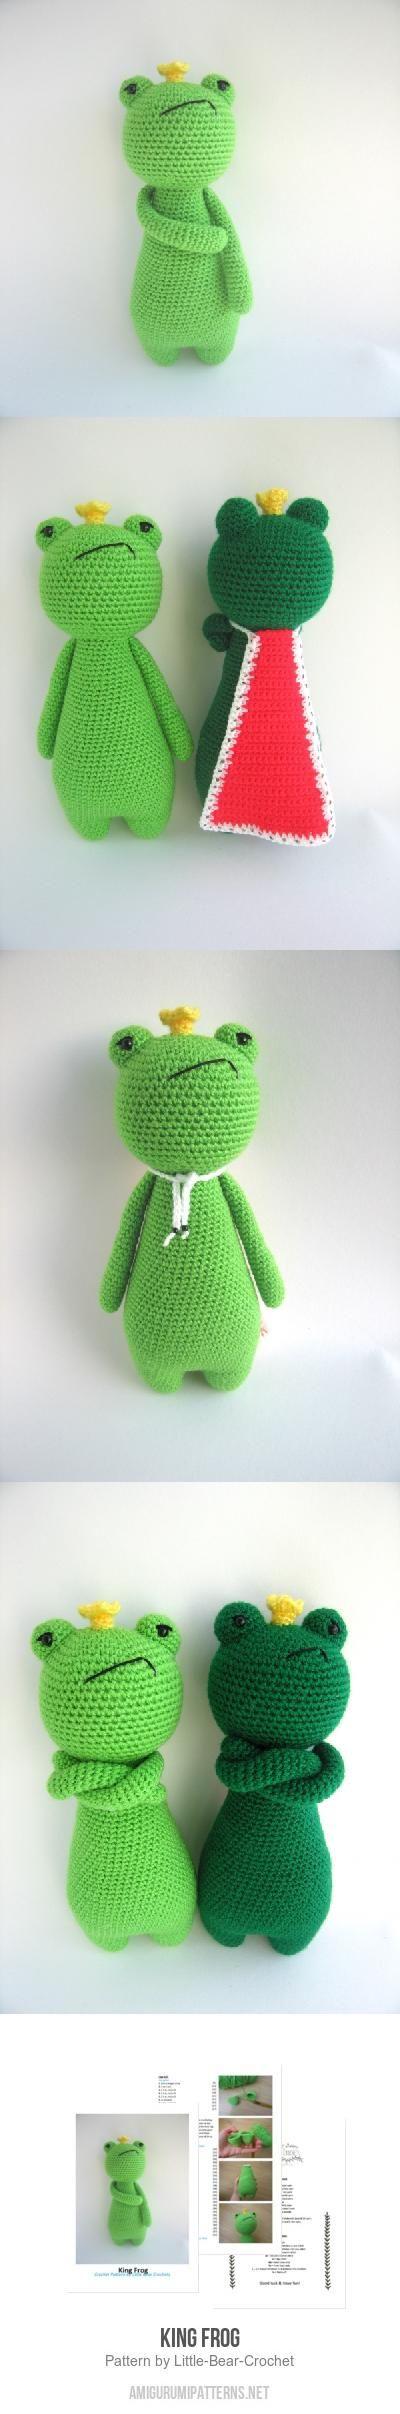 King Frog Amigurumi Pattern